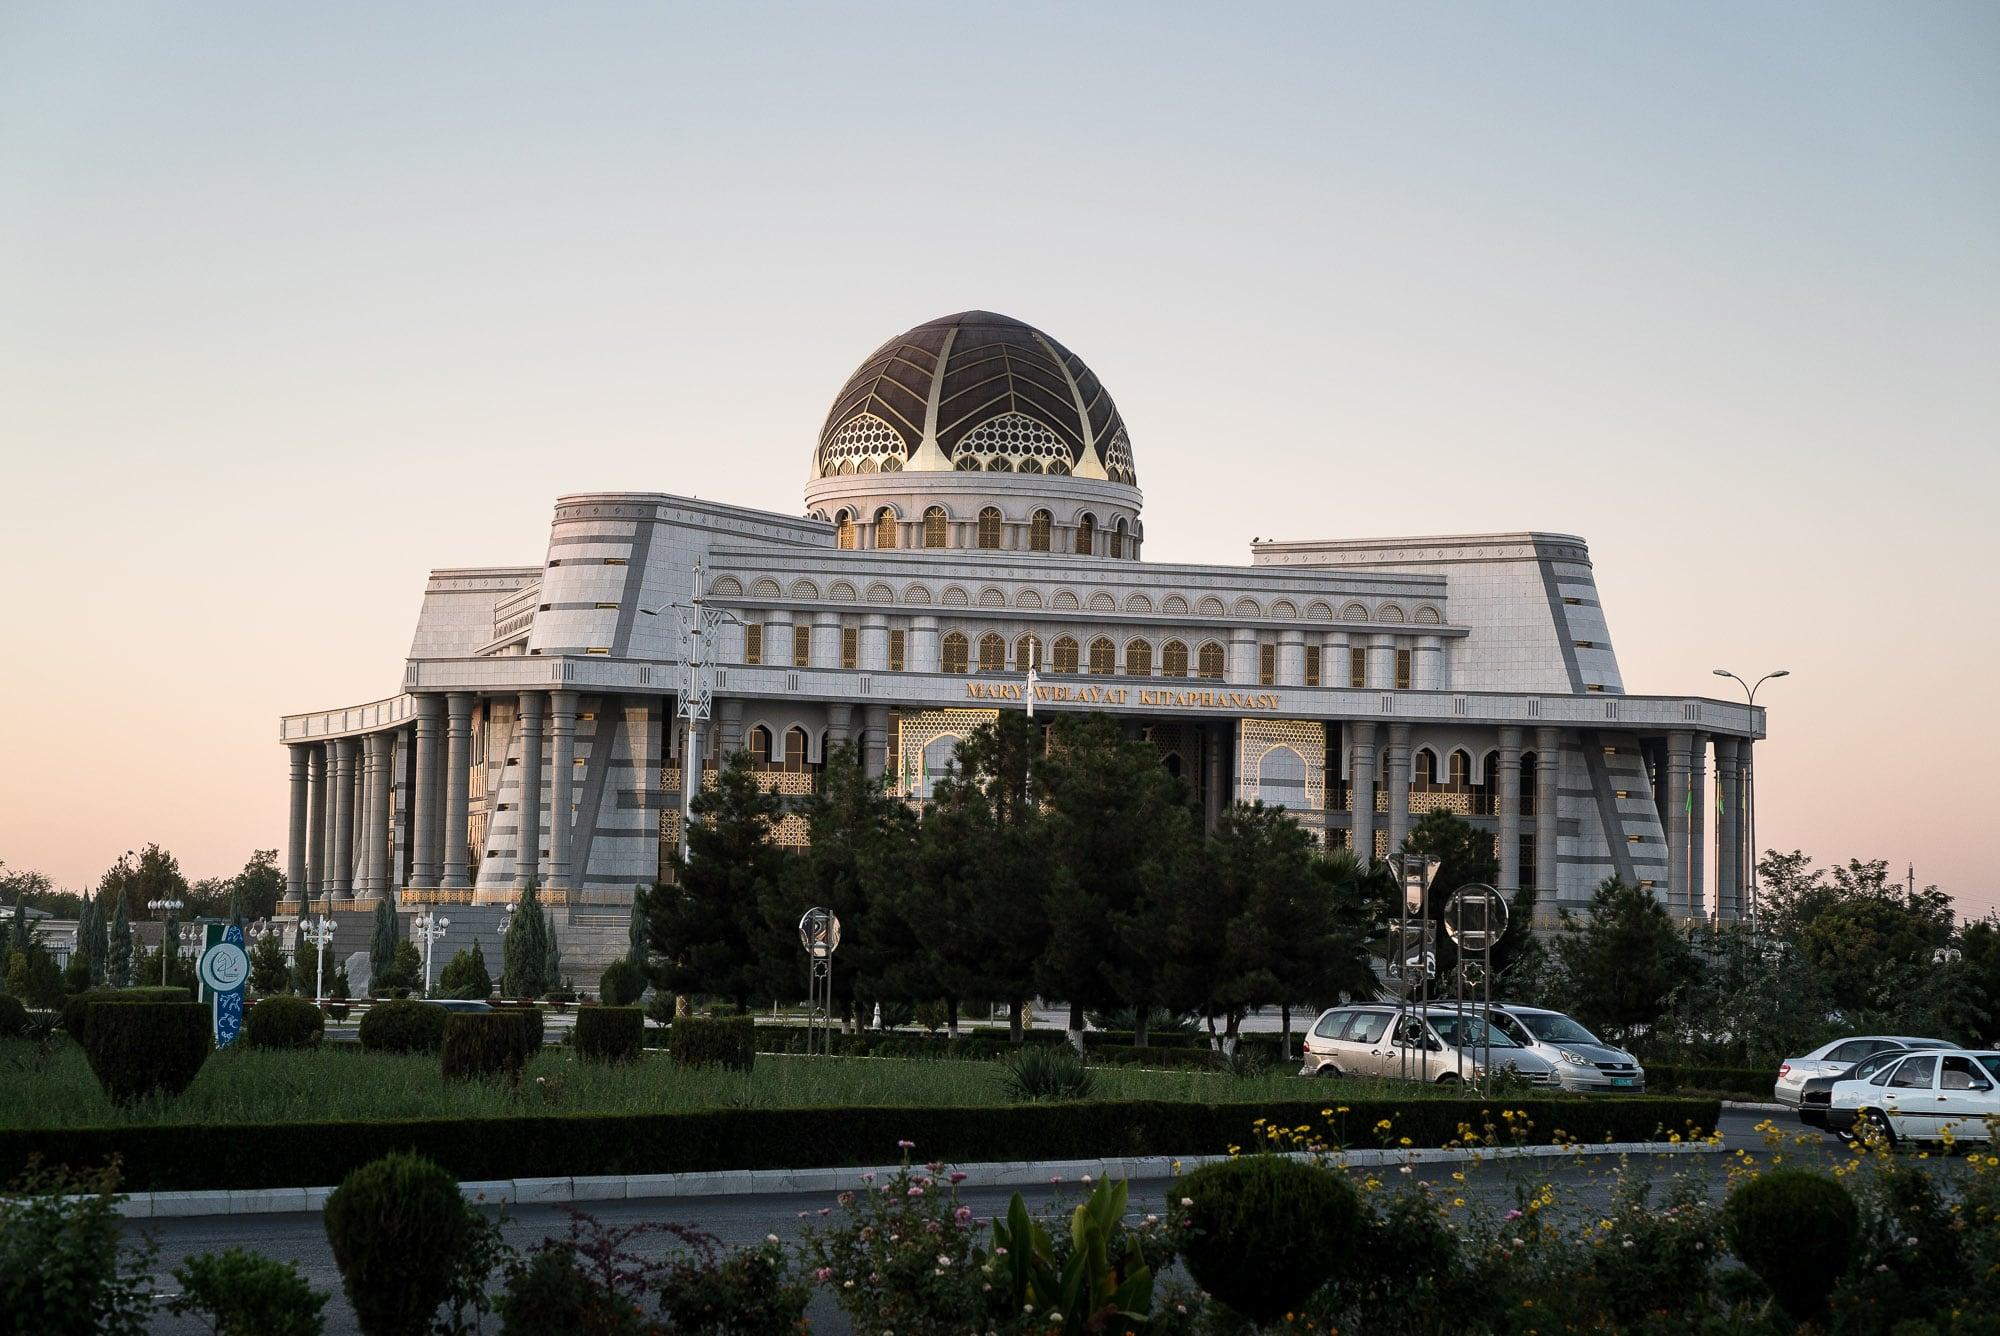 strange big building in Mary